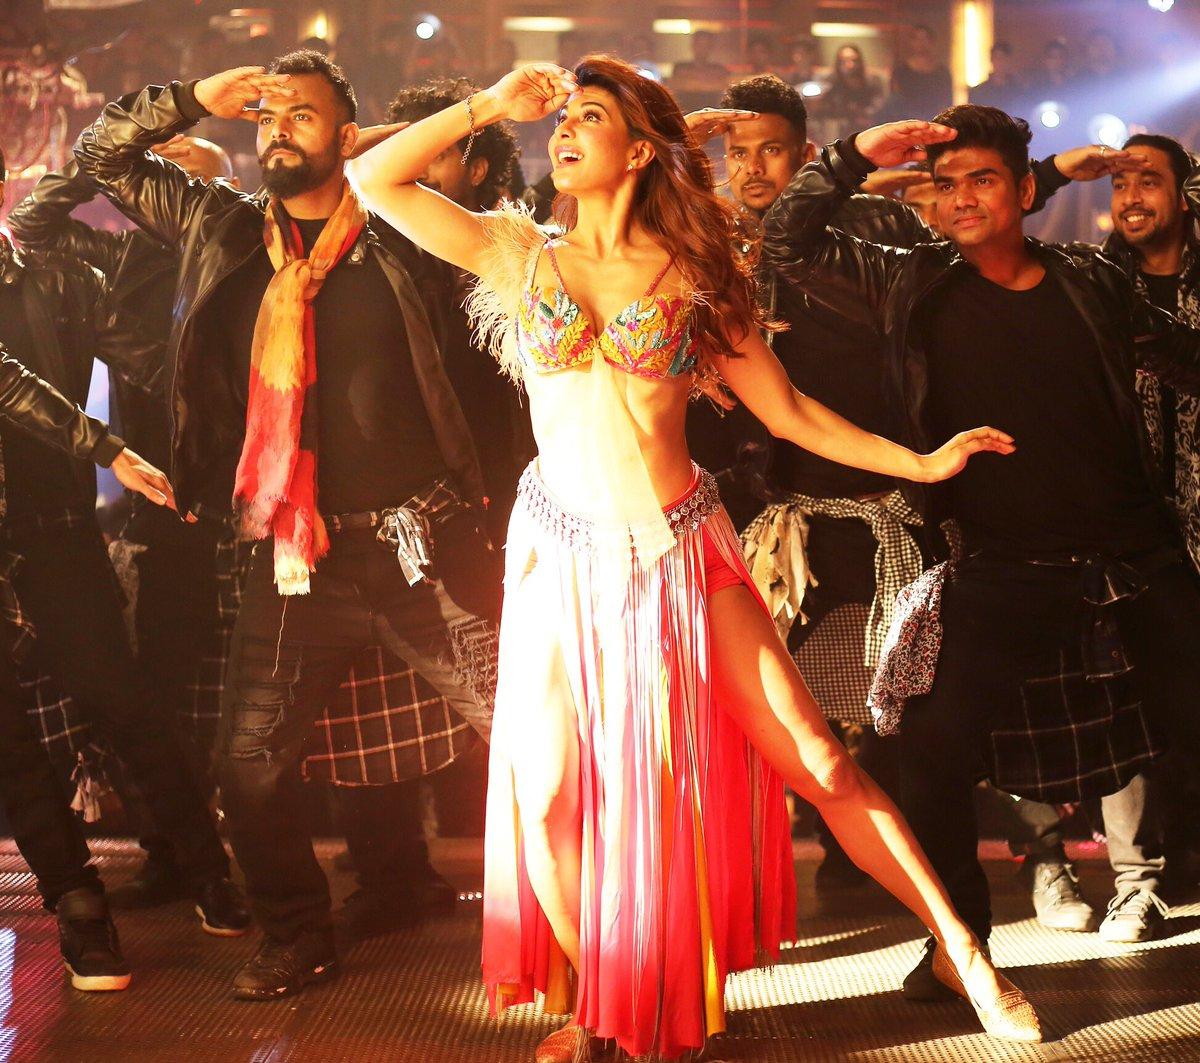 Ek Do Teen Song Baaghi 2 Download Pagalworld: Jacqueline's Ek Do Teen Song: Another Mohini Like Madhuri